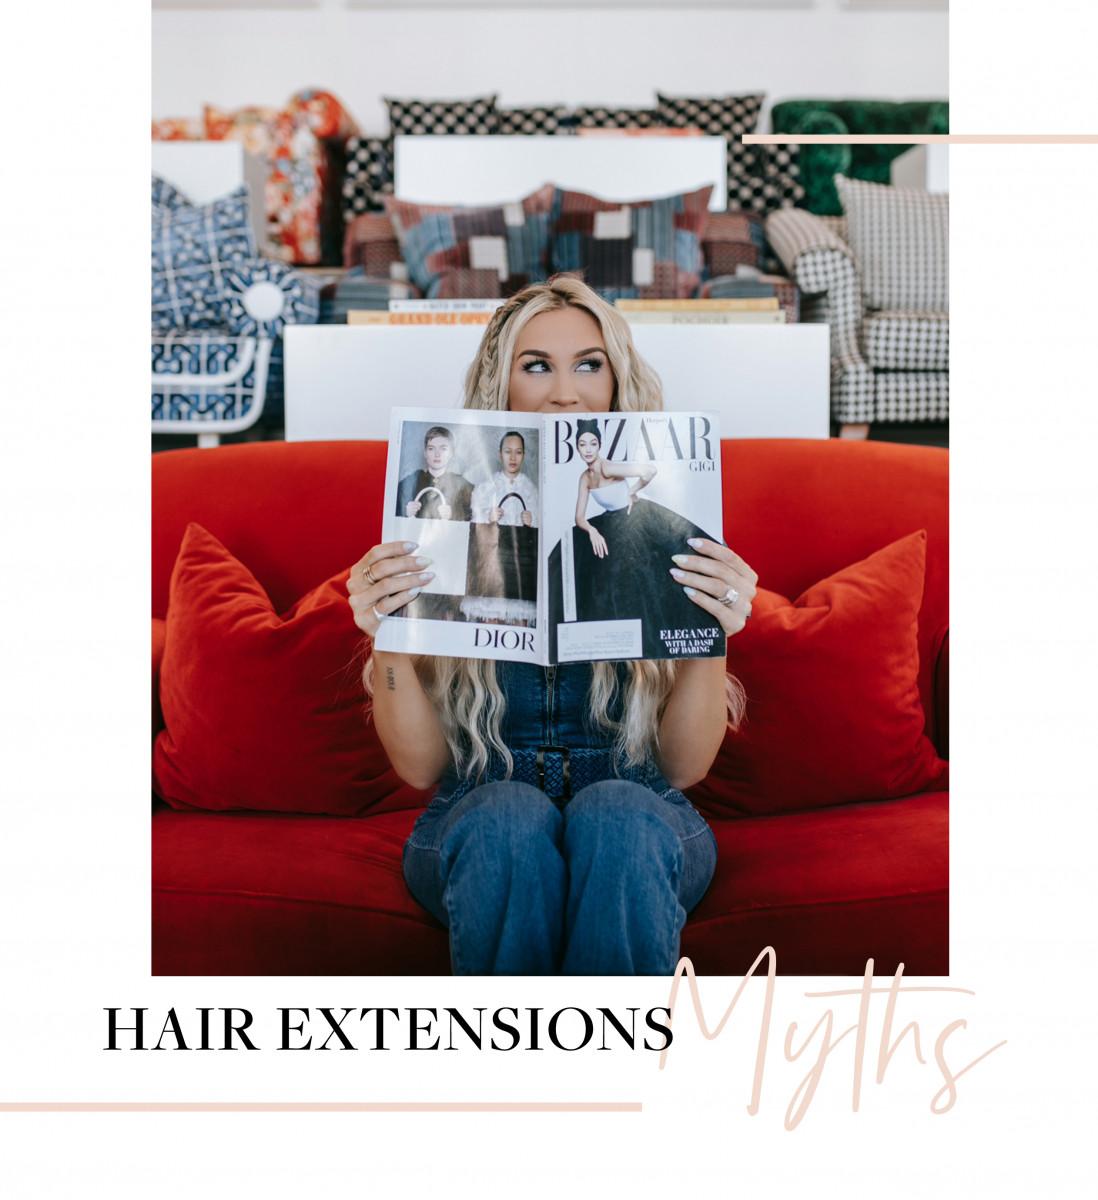 Debunking Hair Extensions Myths